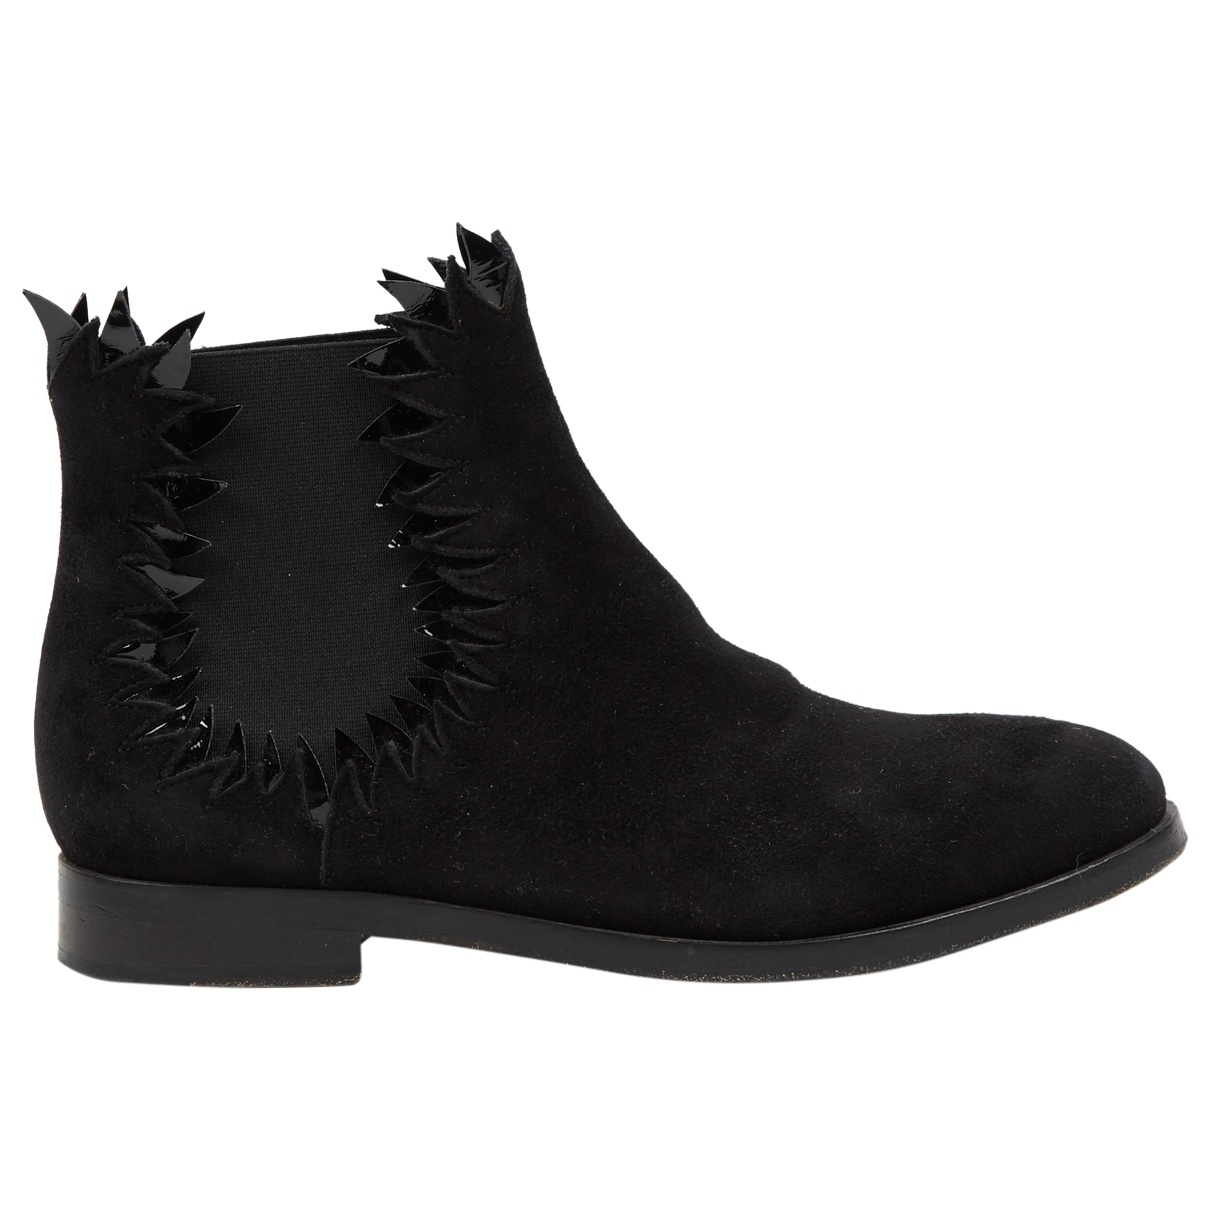 Alaïa \N Black Suede Ankle boots for Women 39.5 EU